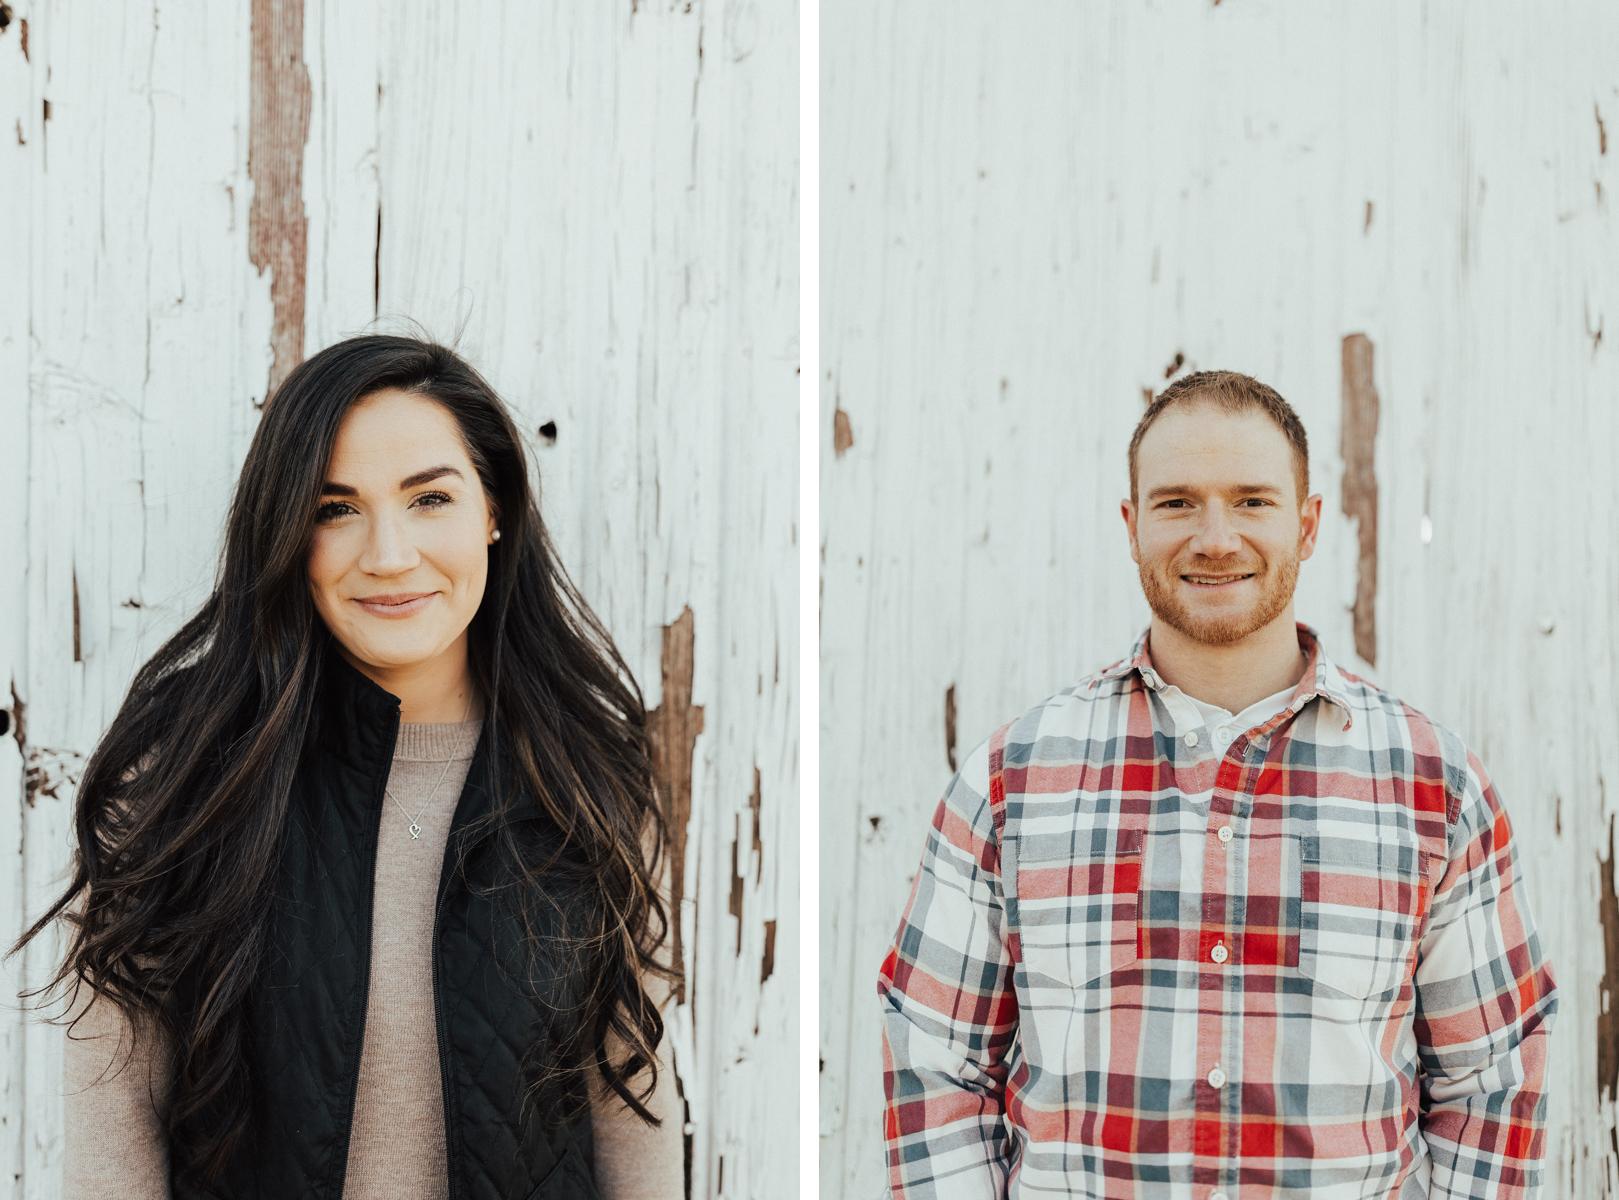 GACo_Michelle-Matt-Engagement_020318-Web-25-duo.jpg